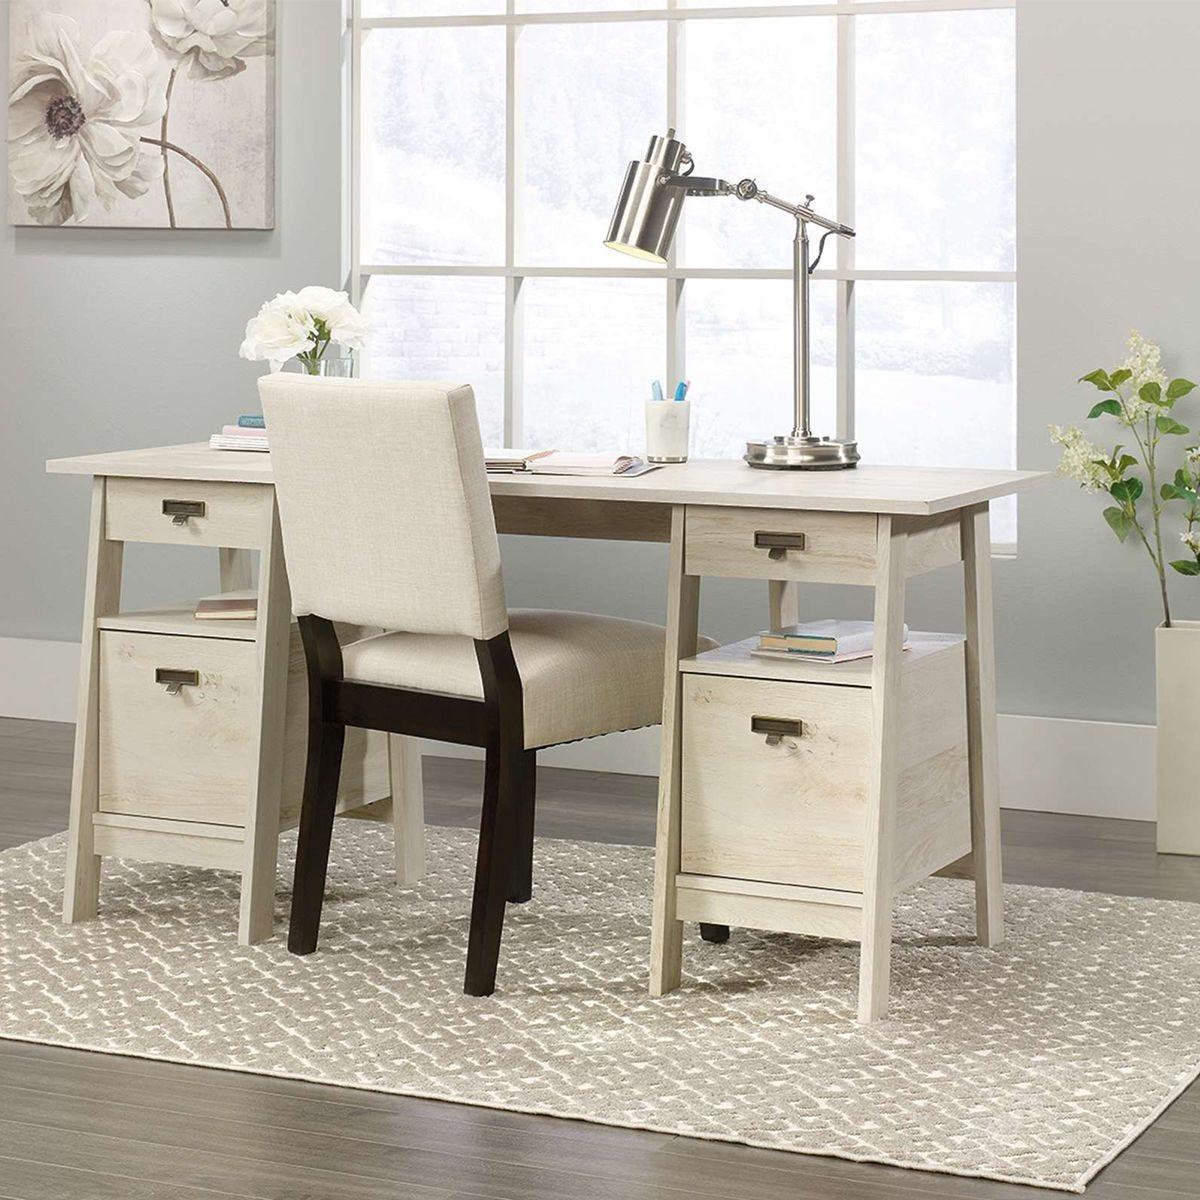 Teknik Executive Trestle Desk - Chalked Chestnut Finish